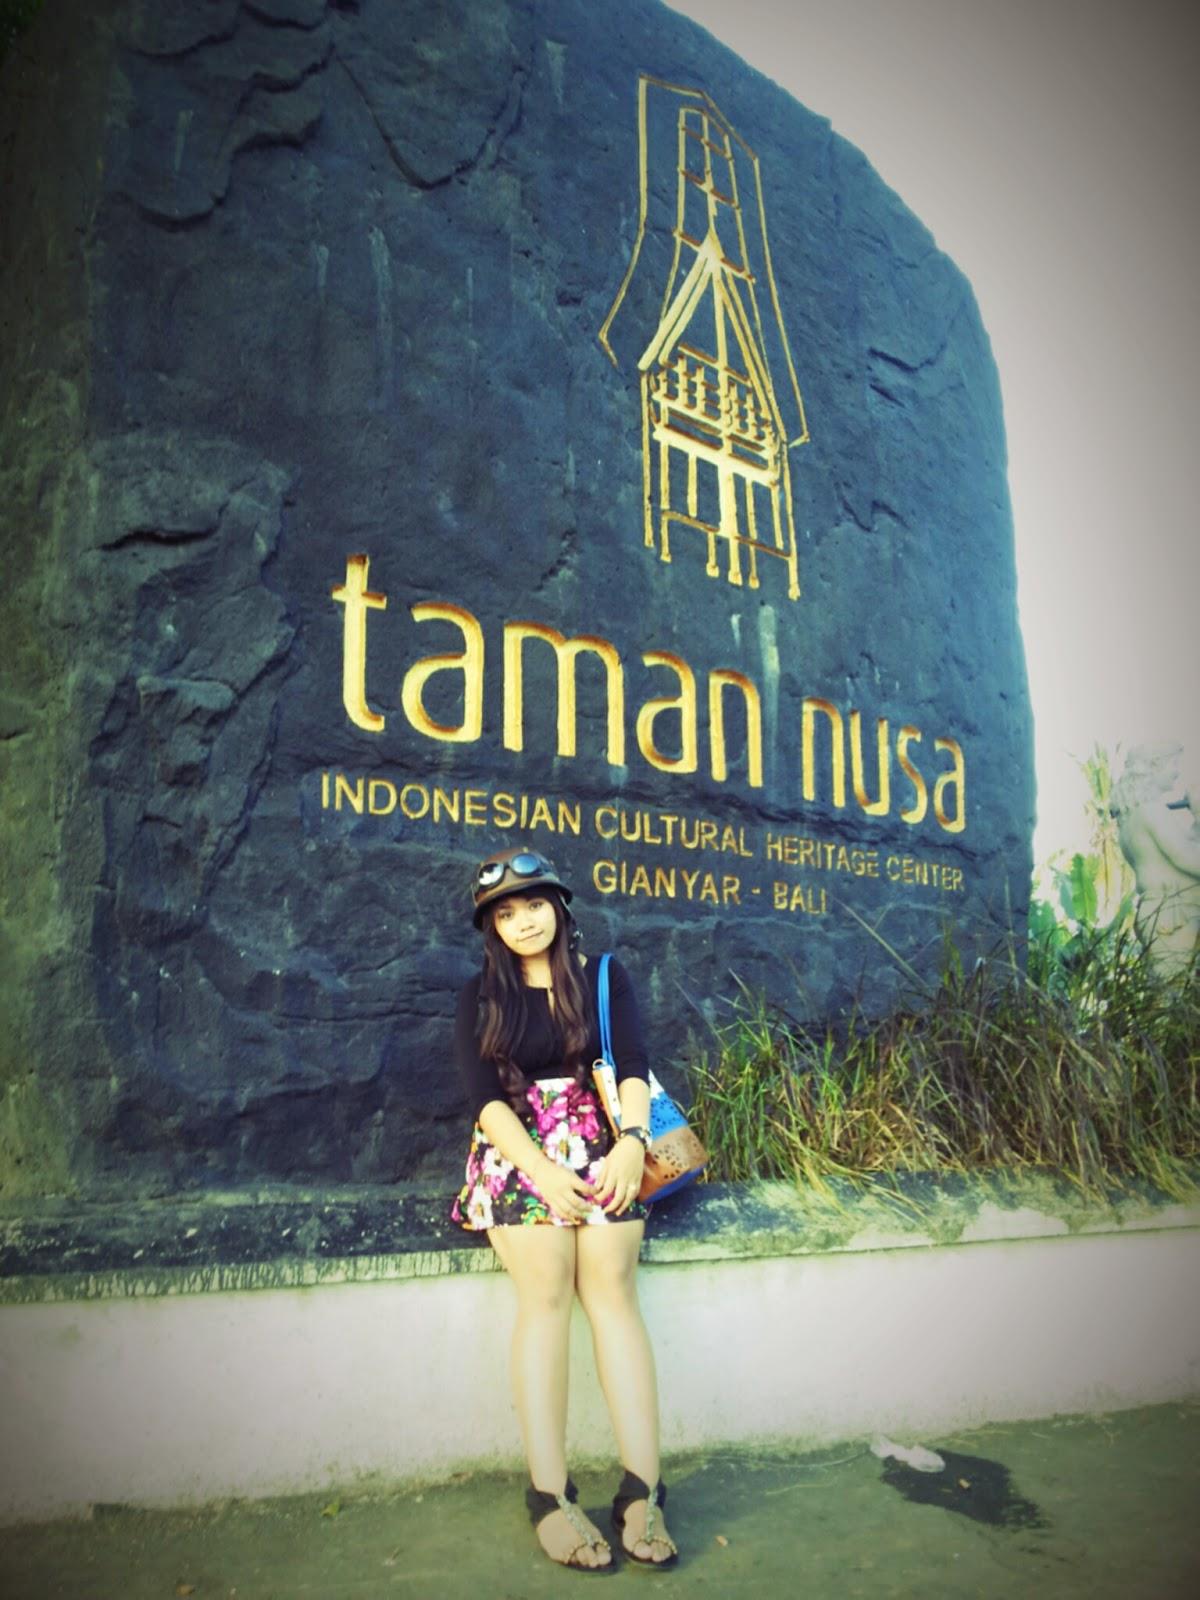 Objek Pariwisata Bali Taman Nusa Gianyar Kab